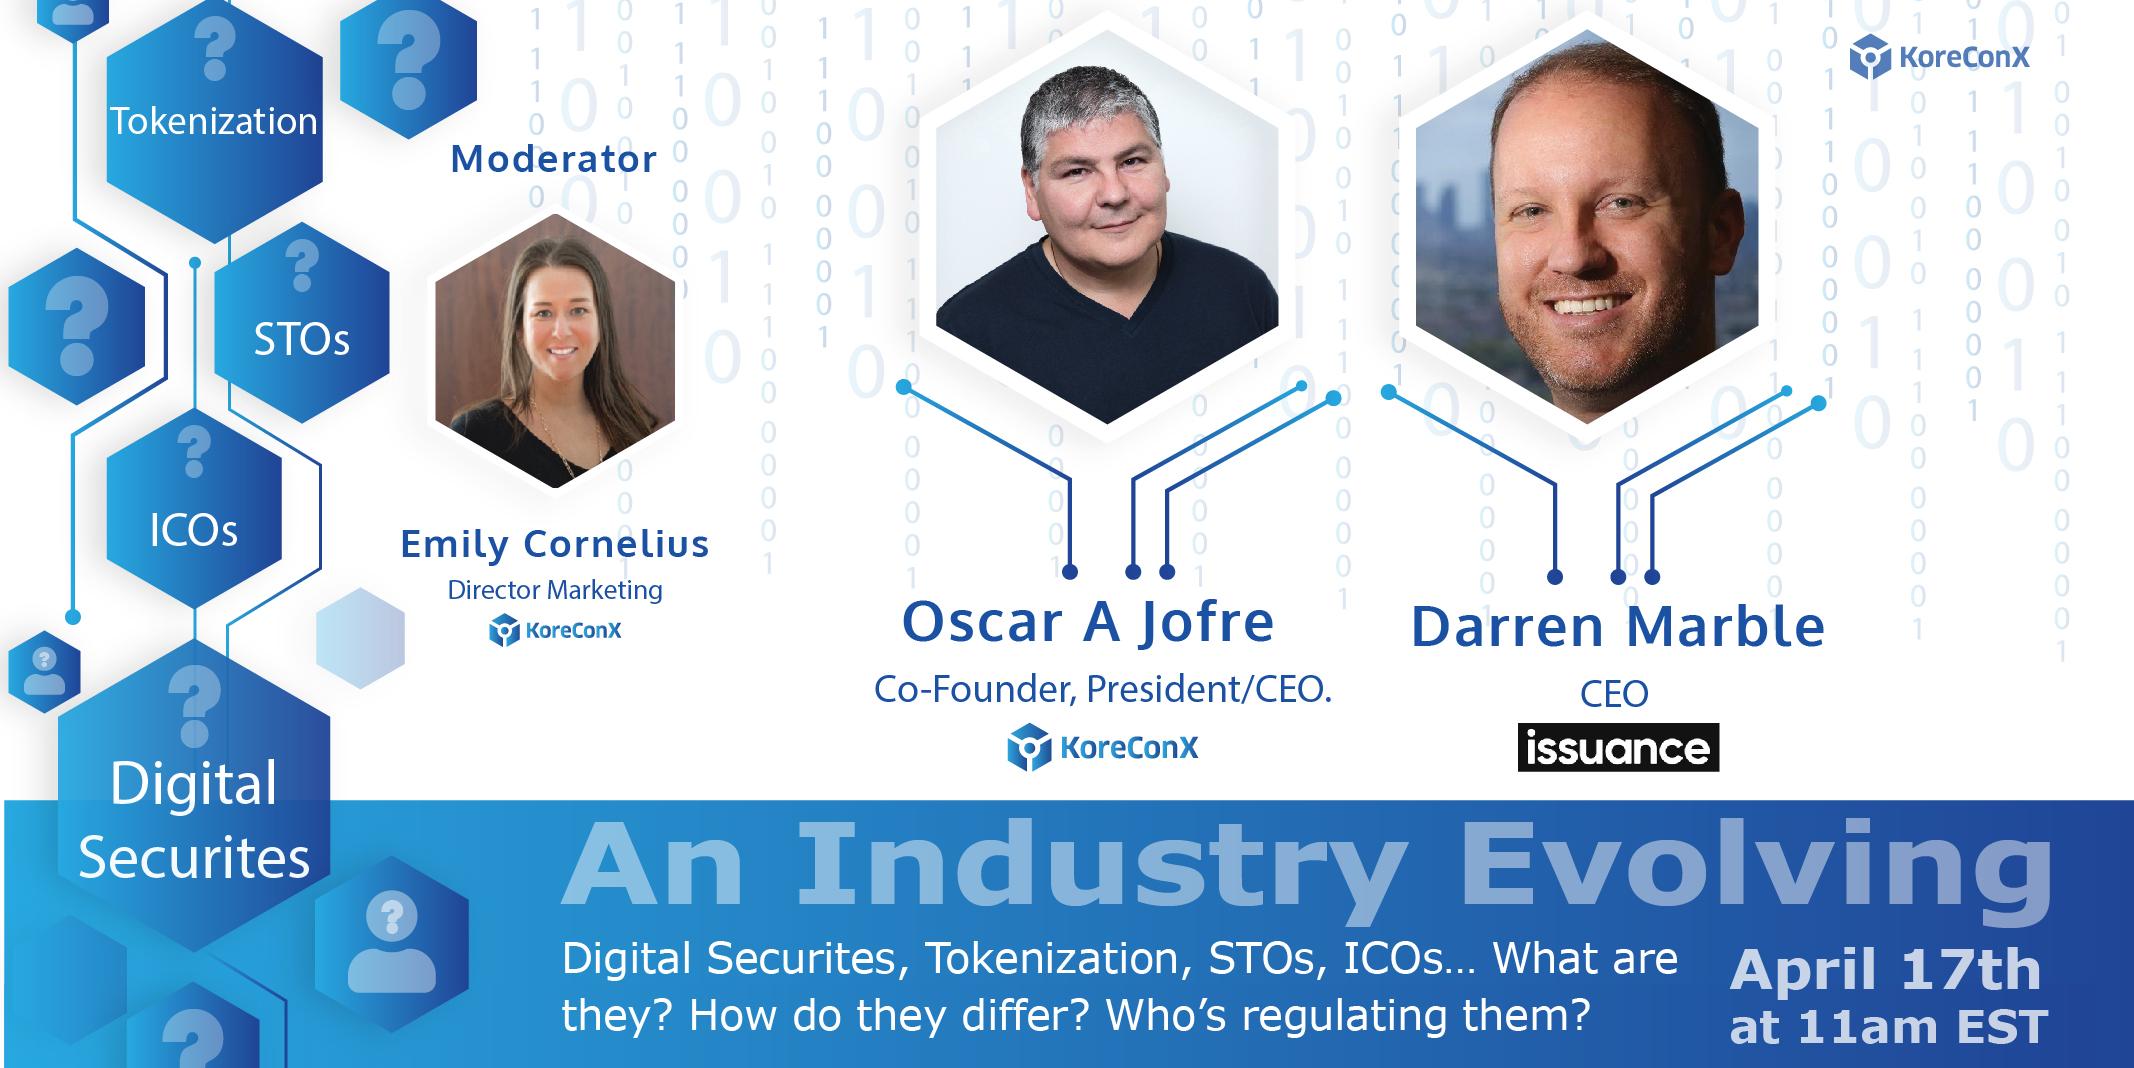 KoreConX An Industry Evolving